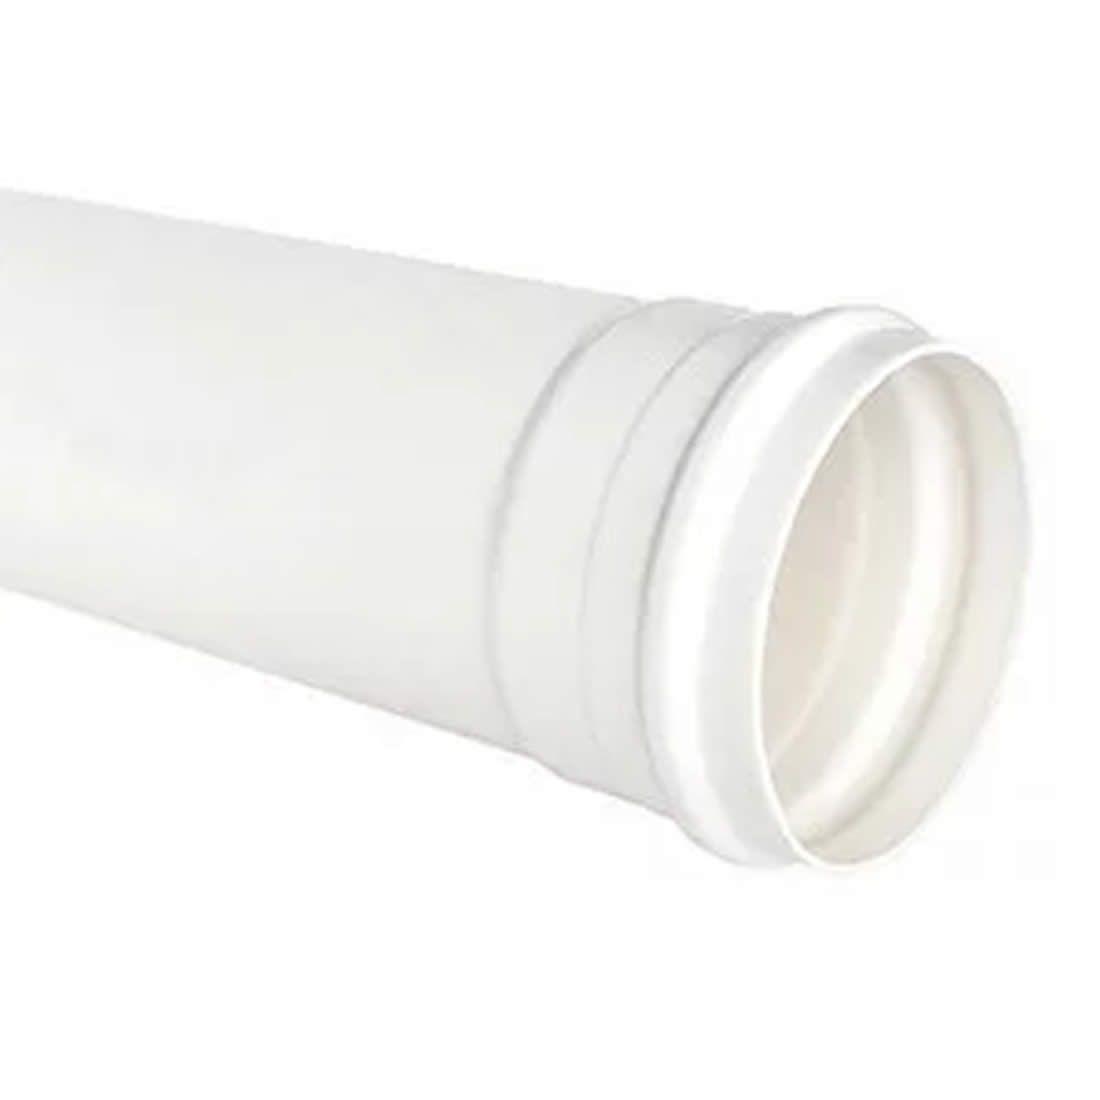 Tubo PVC Para Esgoto 50mm X 6 Metros Tigre